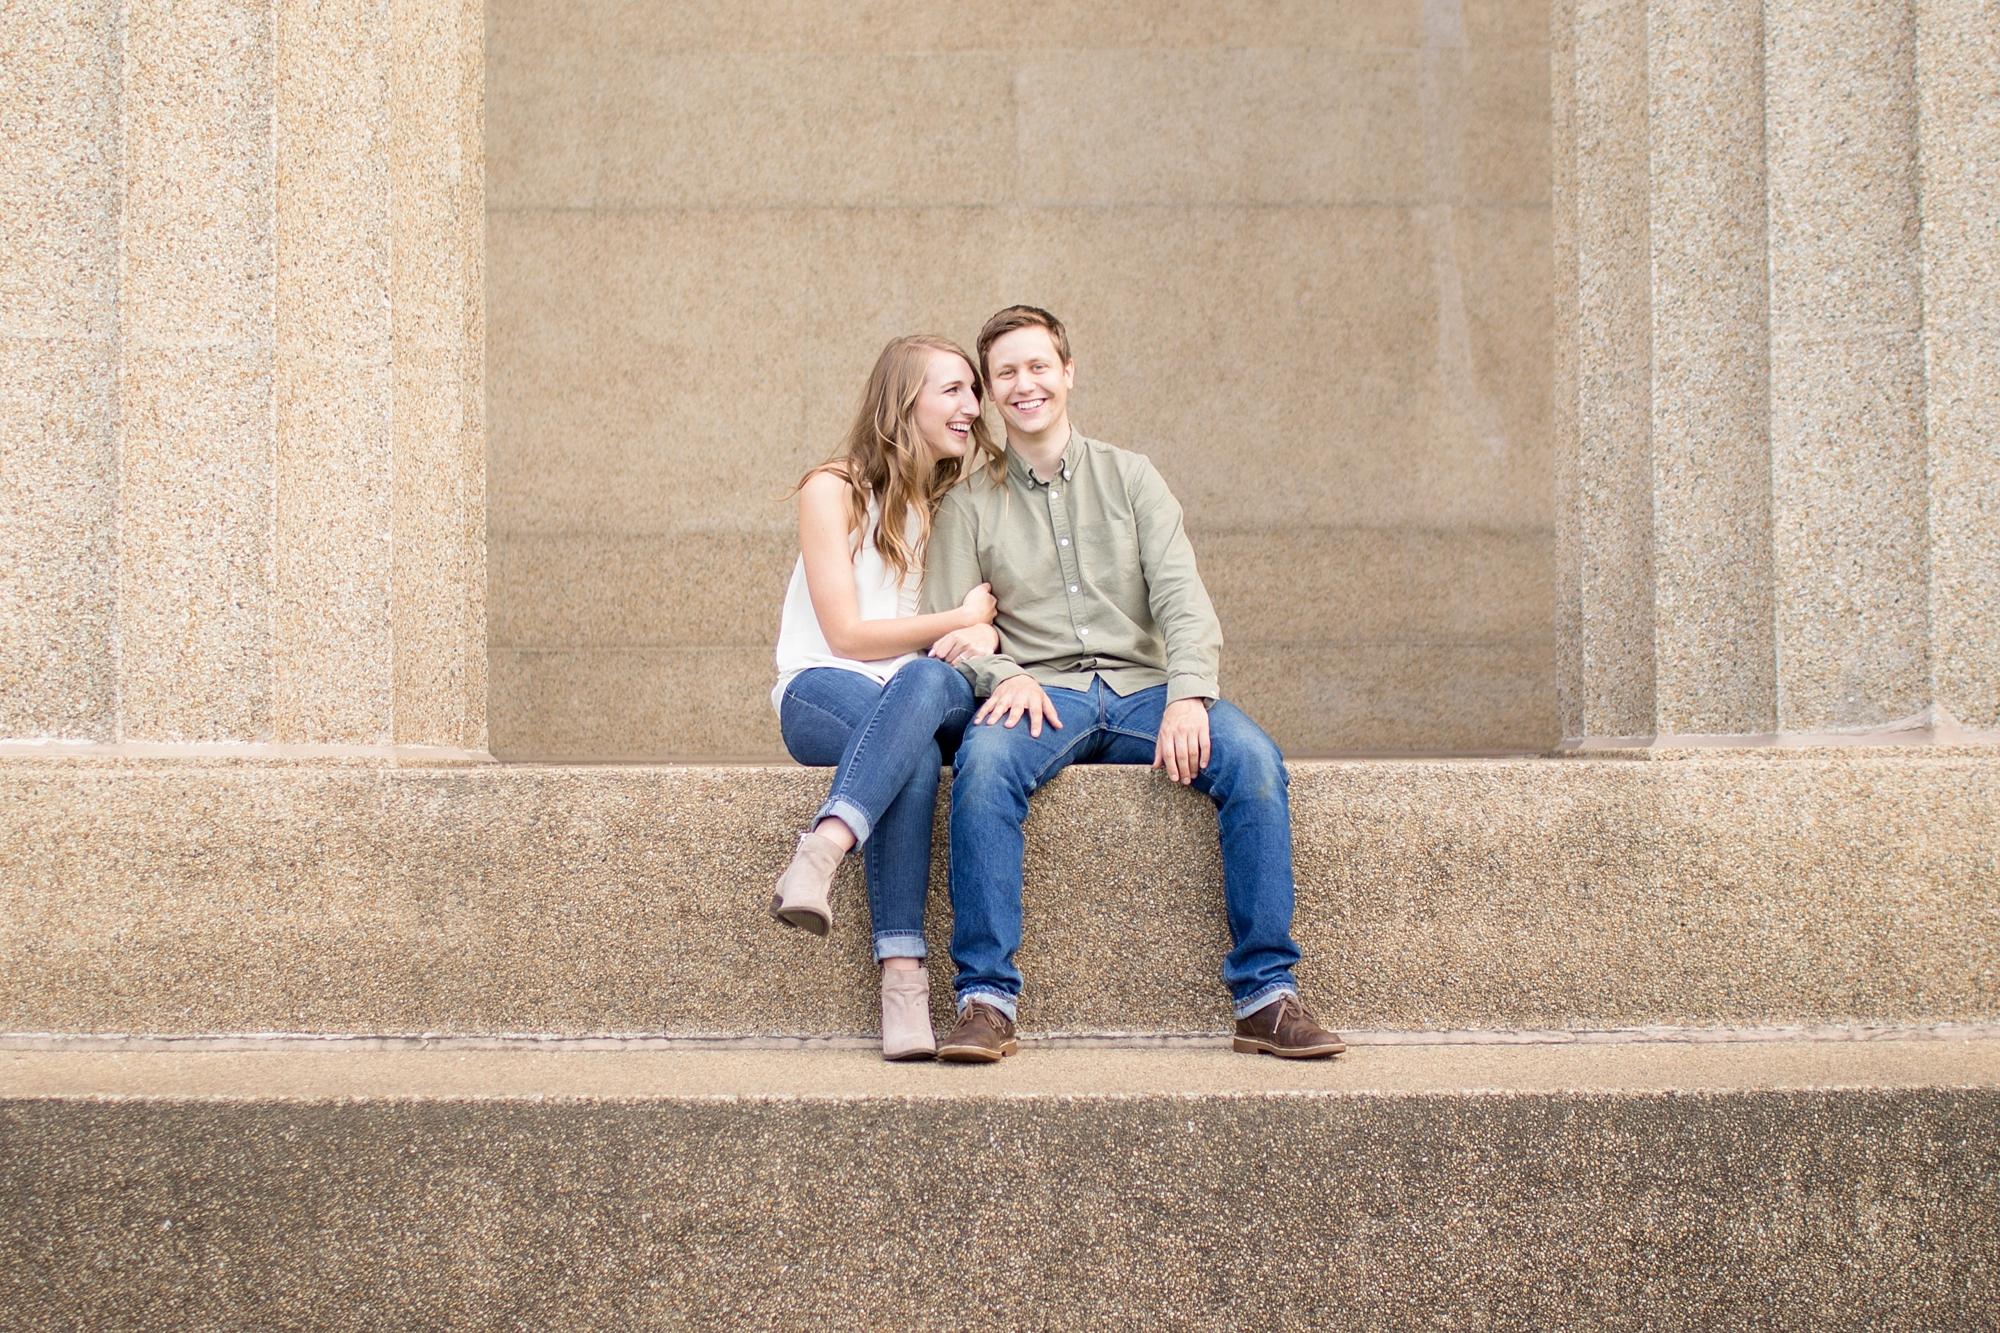 Erin & Jackson Engagement-90_anna grace photography nashville tennessee engagement photographer destination photographer photo.jpg